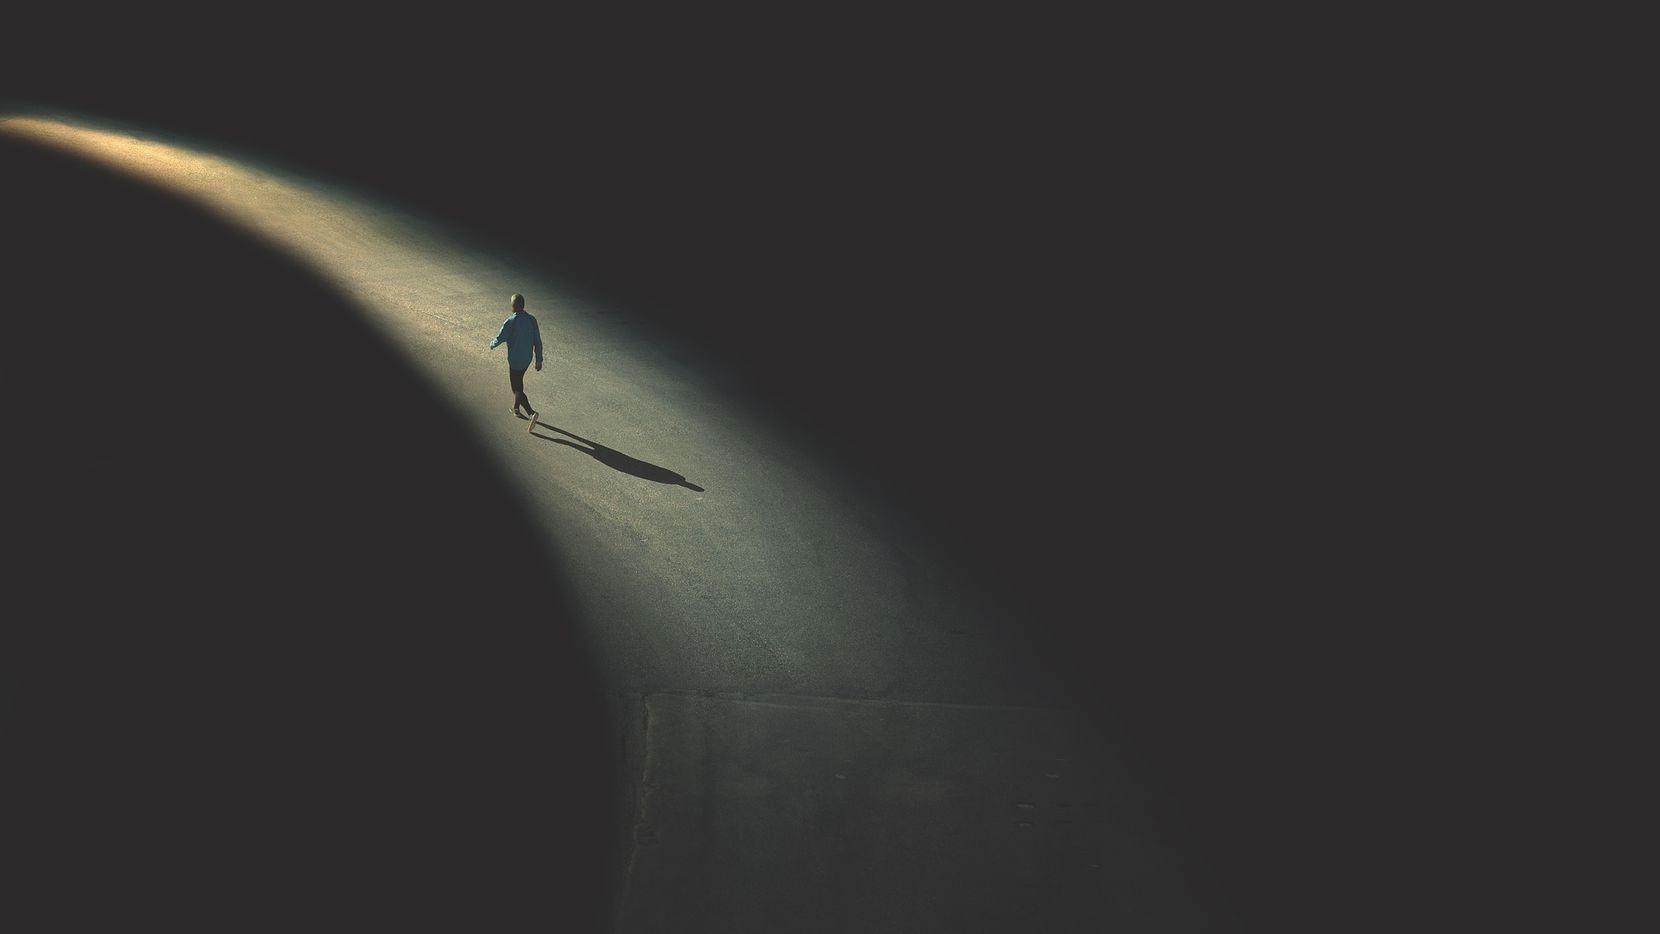 man walking in the night